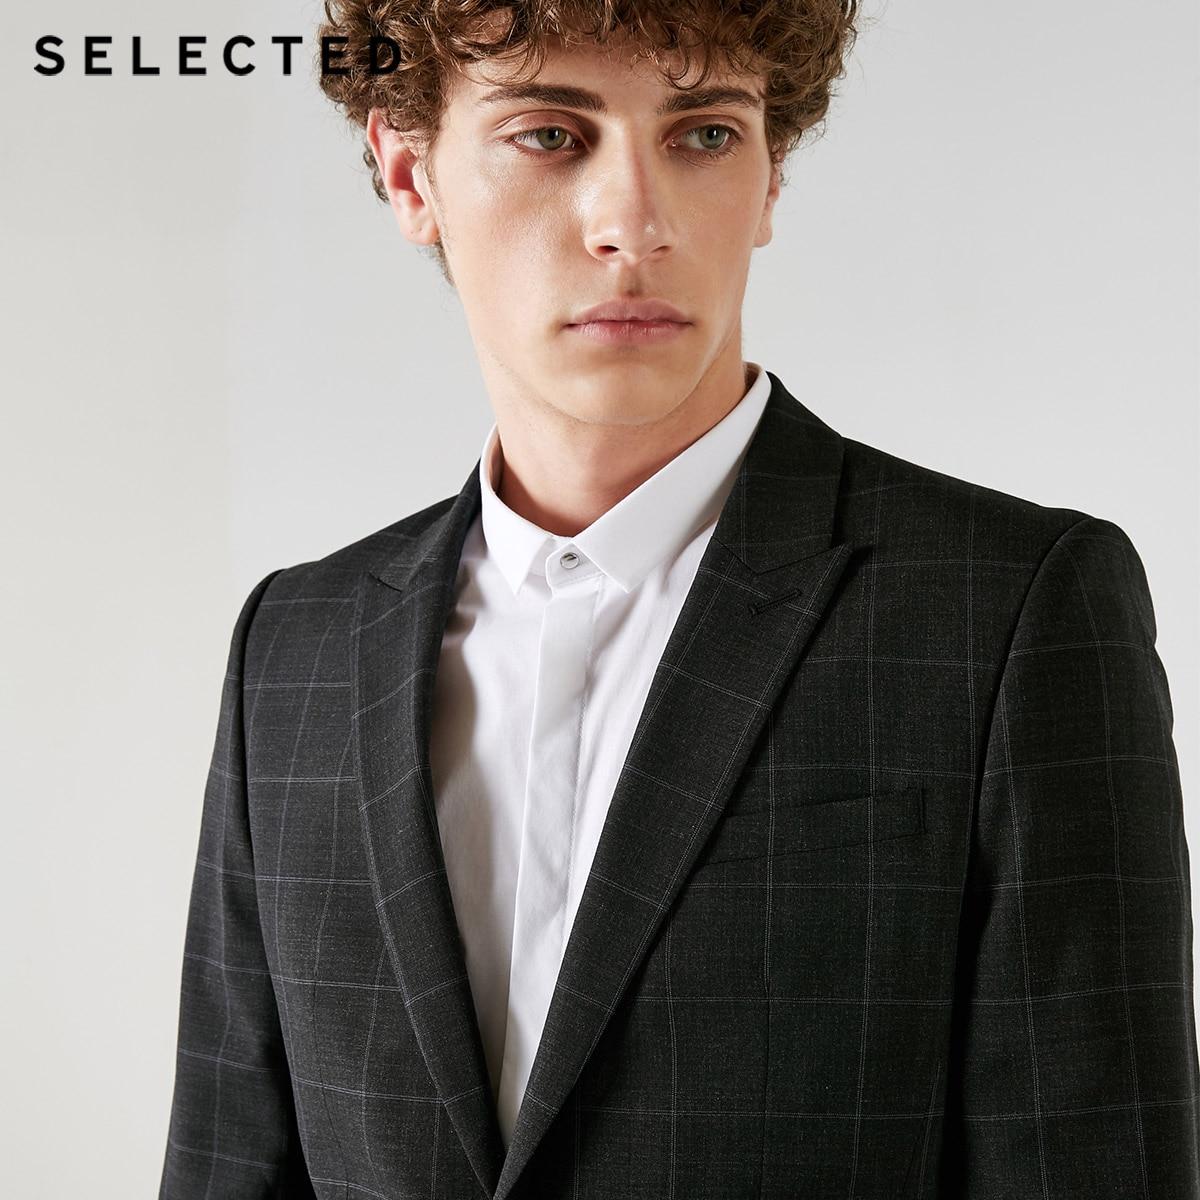 SELECTED Blackrock's New Men Containing Plaid Business Suit Blazer Bussiness Clothes T | 41835Y501